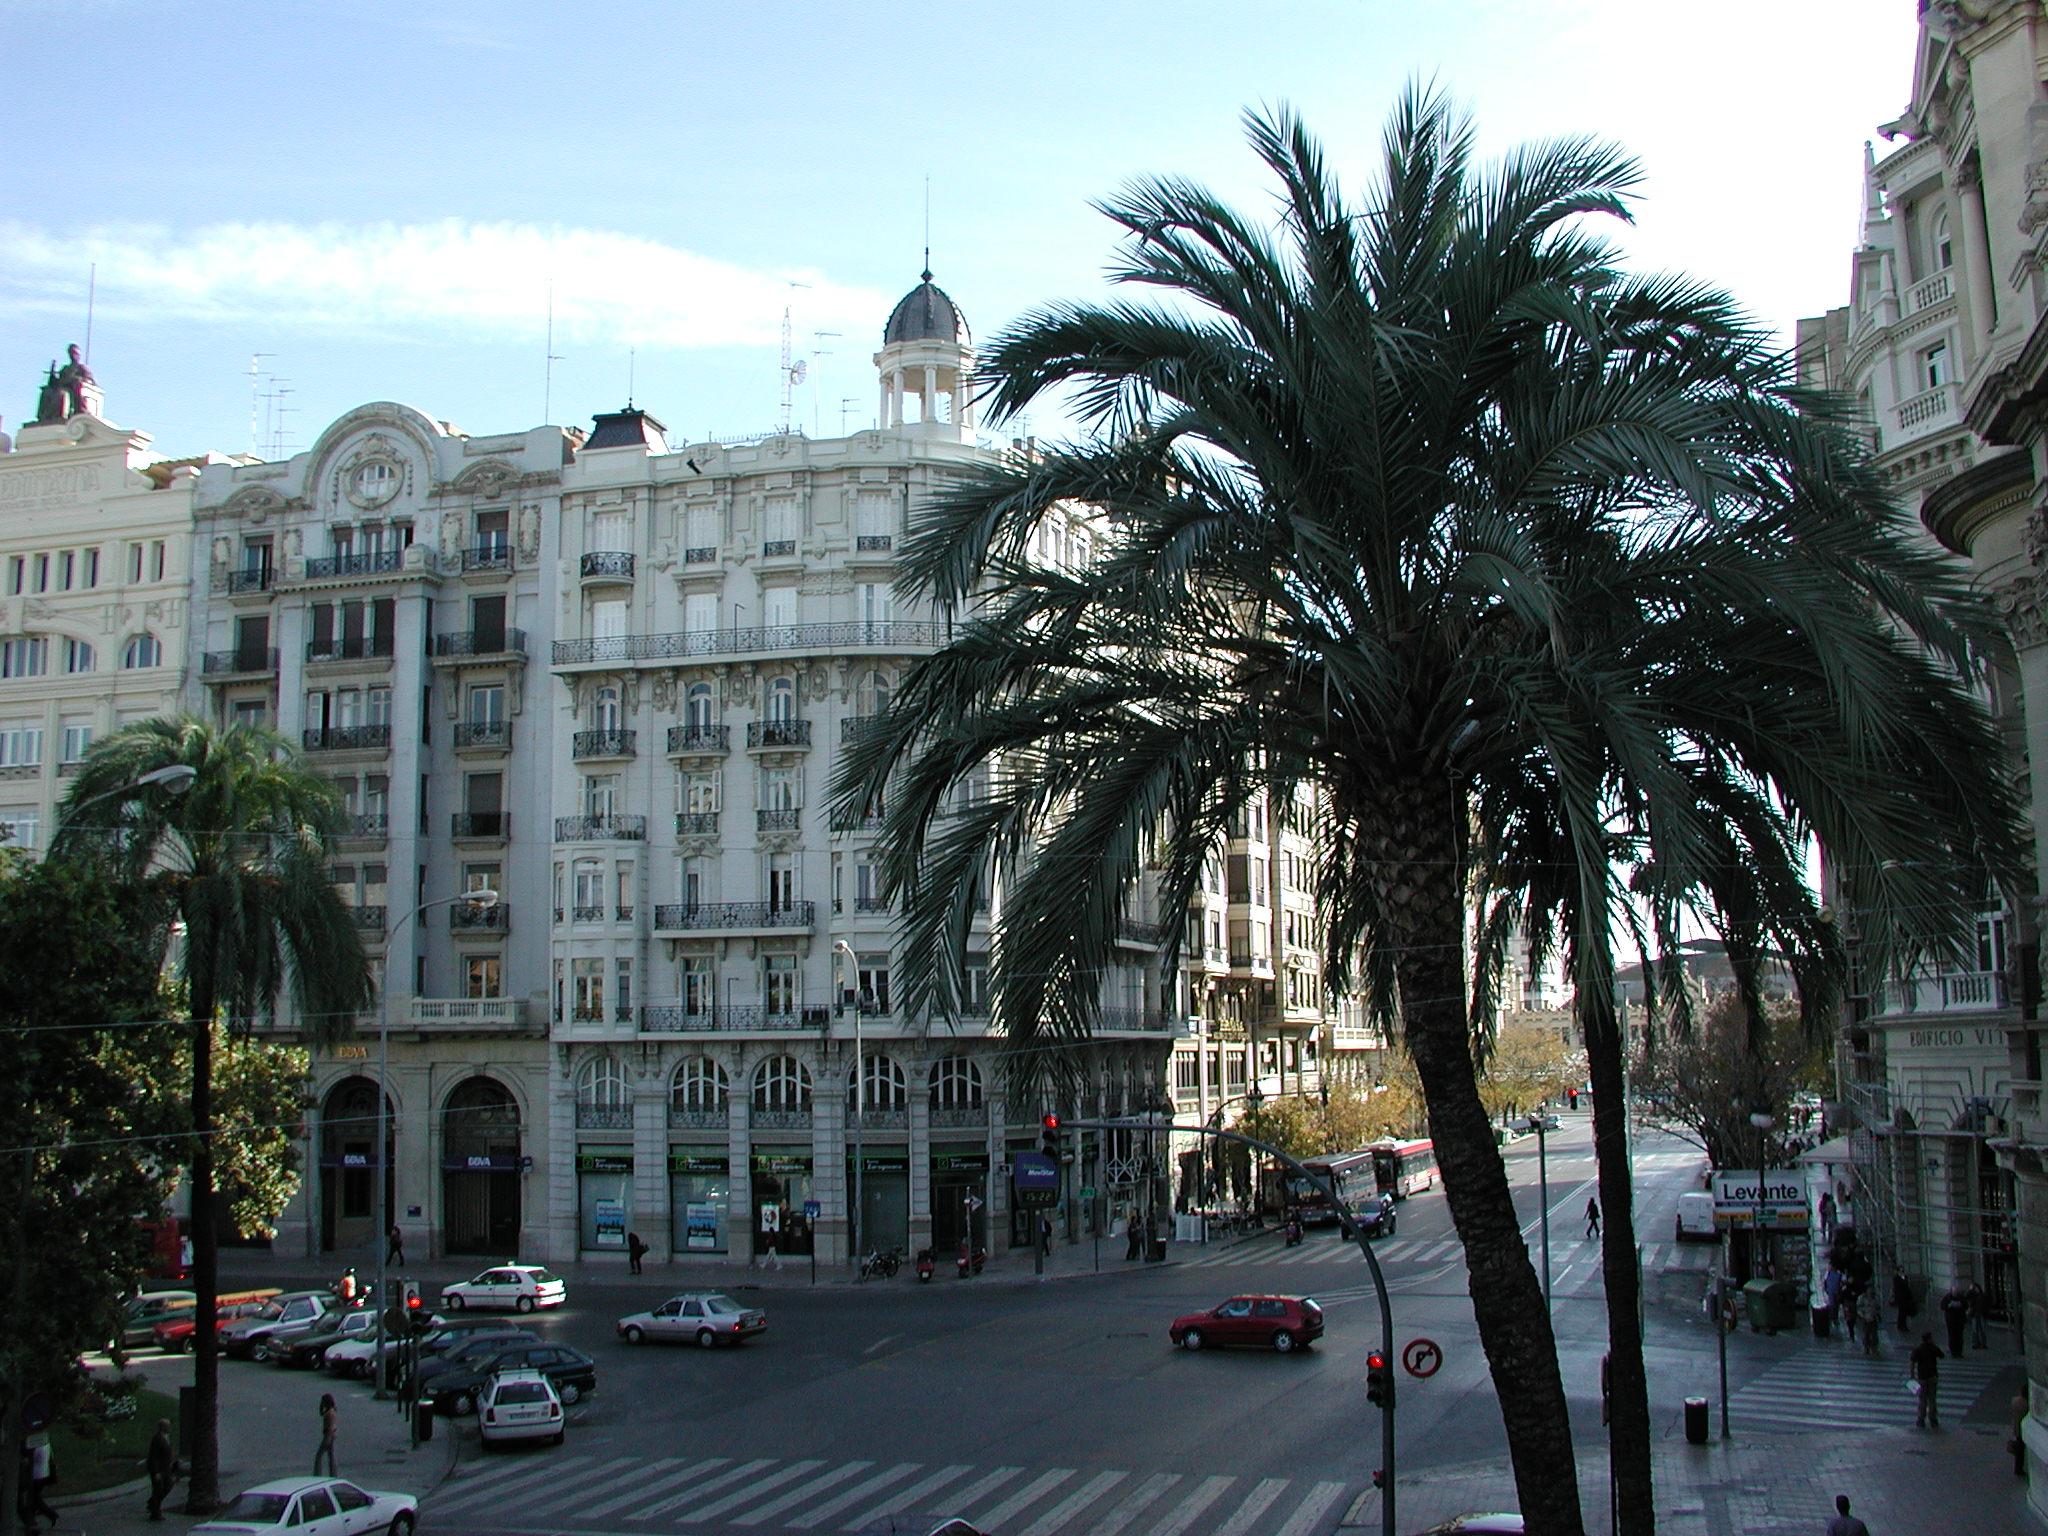 City Center Valencia Spain